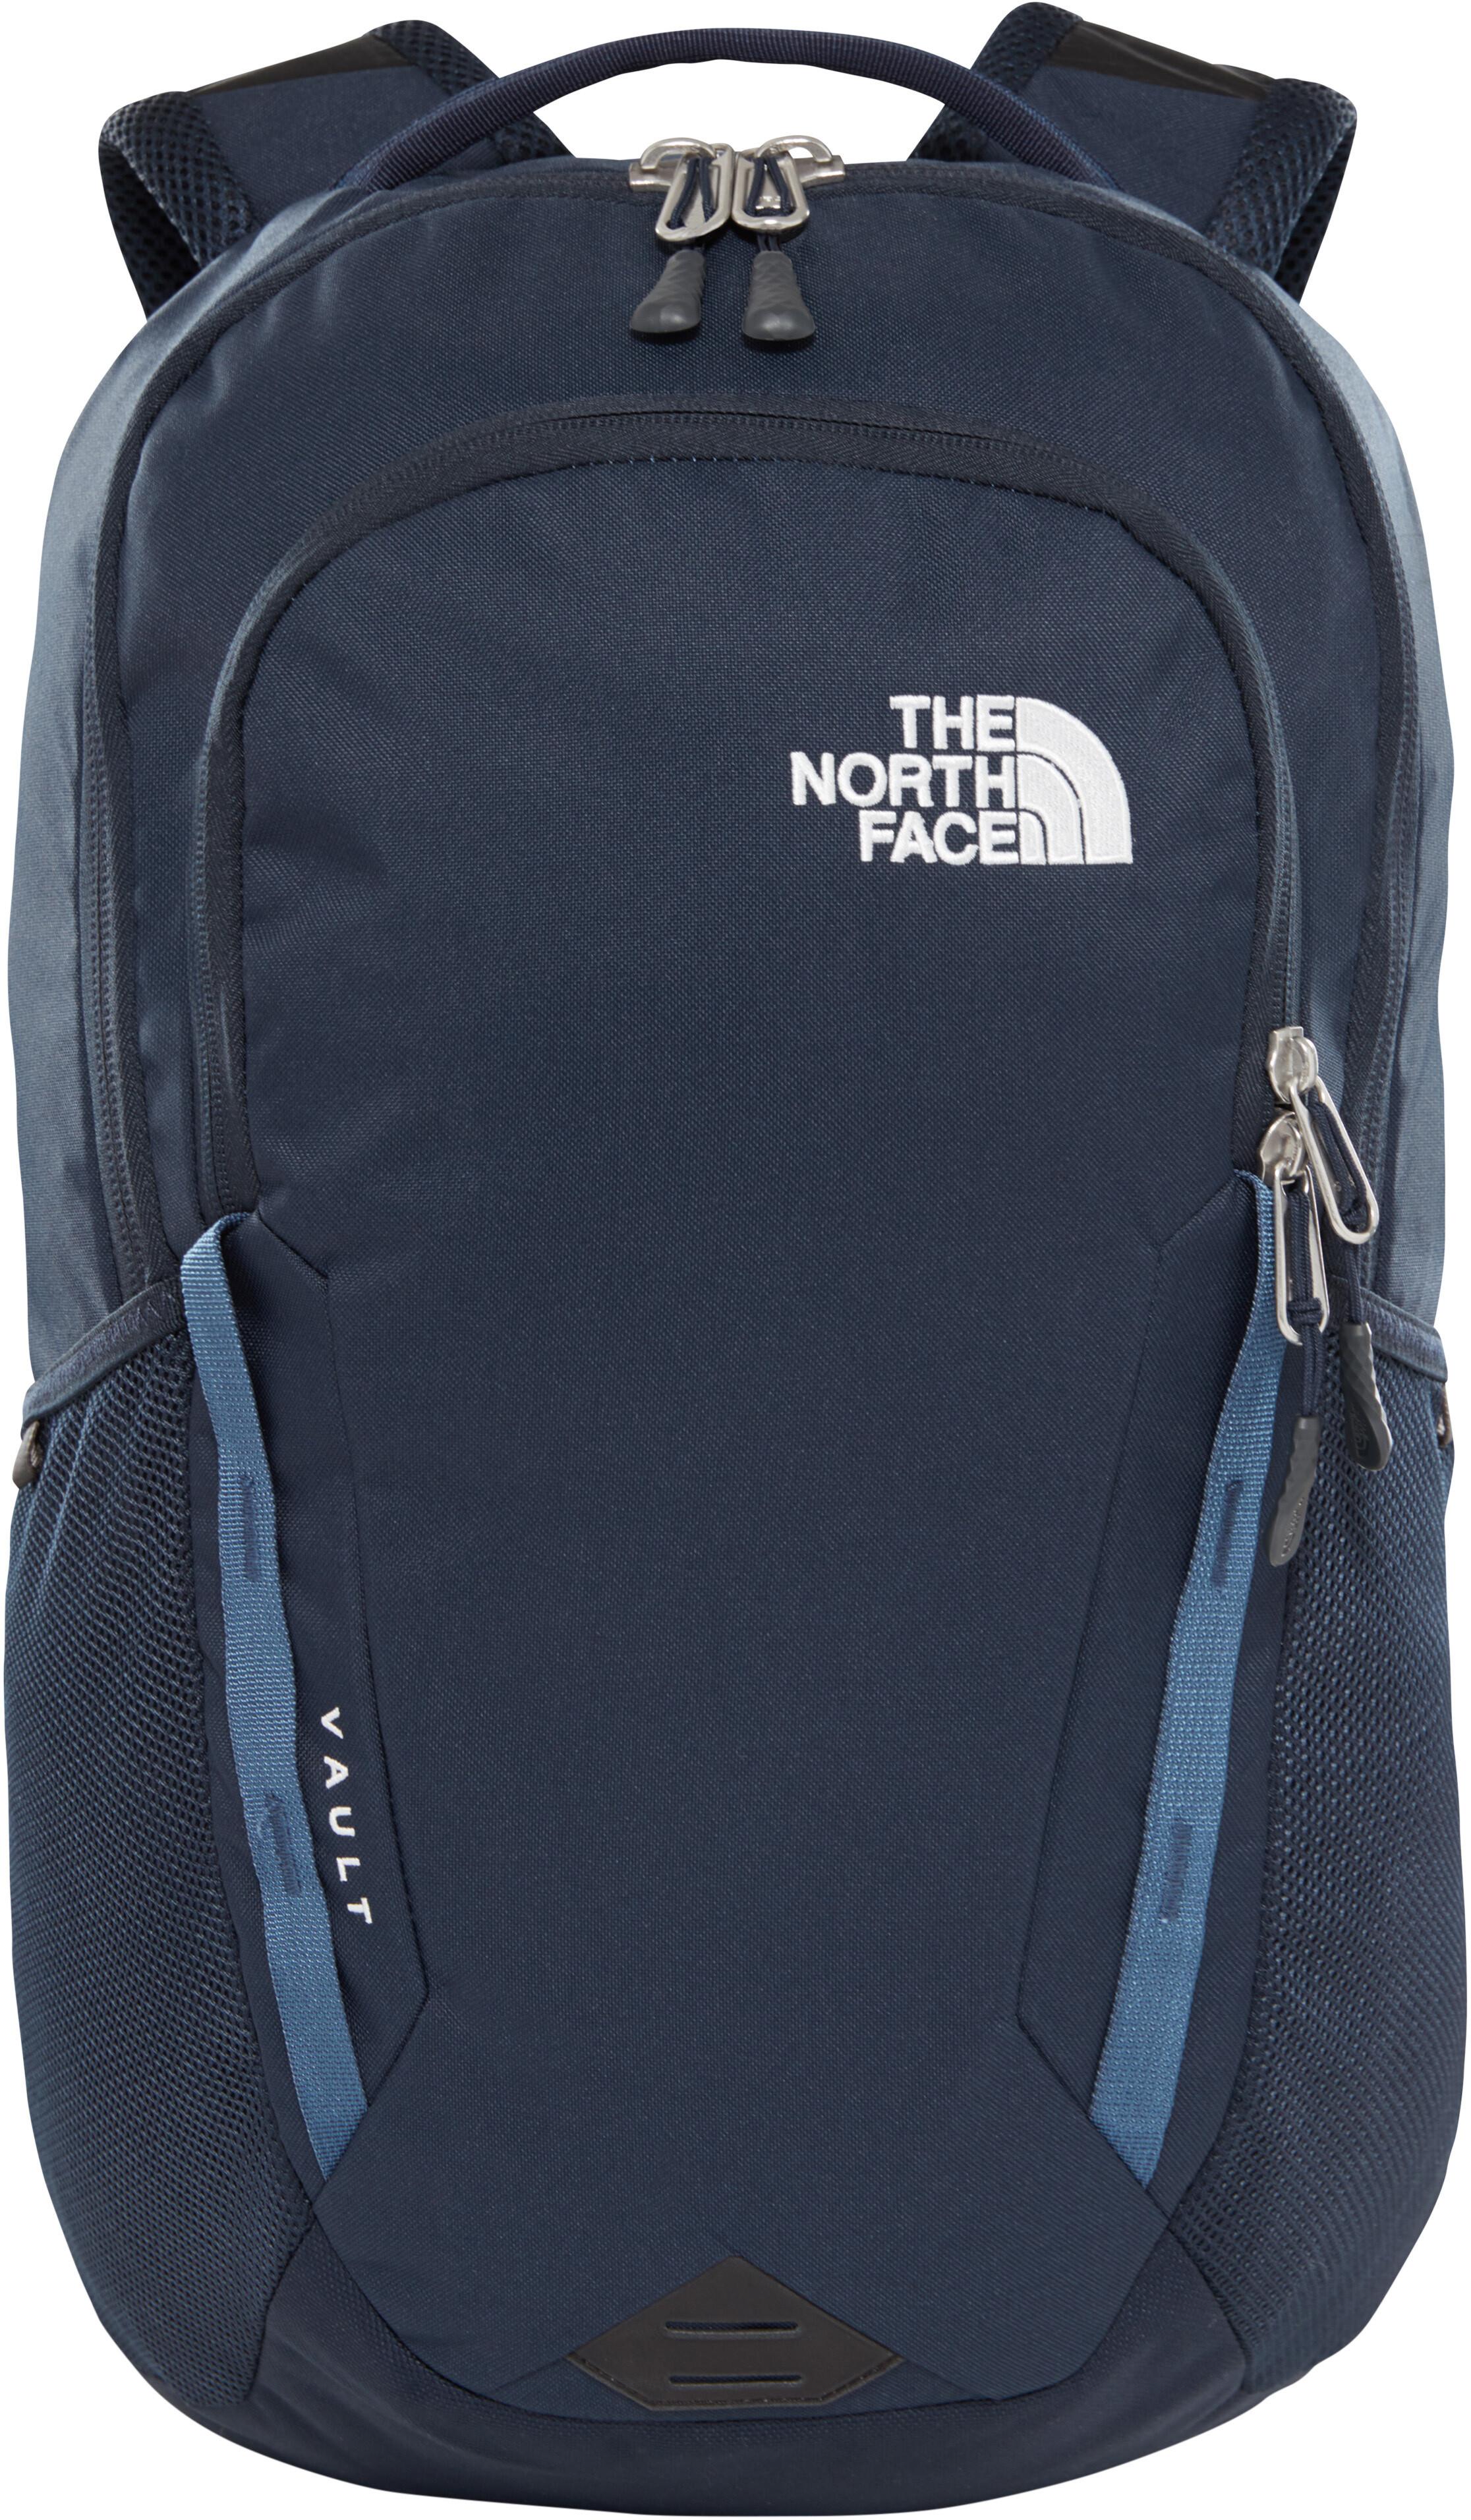 3640785e6 The North Face Vault Ryggsekk shady blue/urban navy